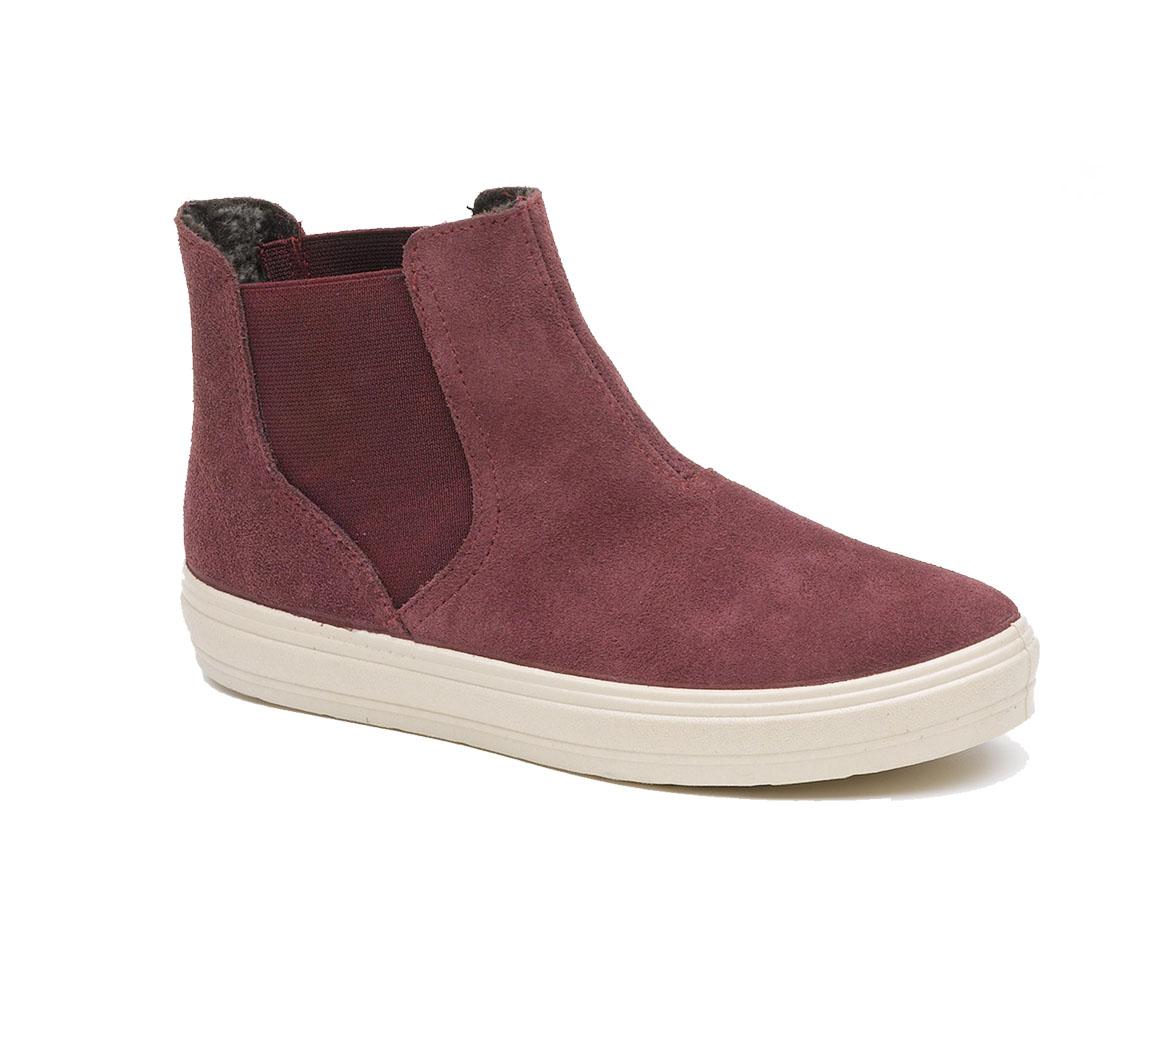 Chaussure femme Bota Elasticos Suede